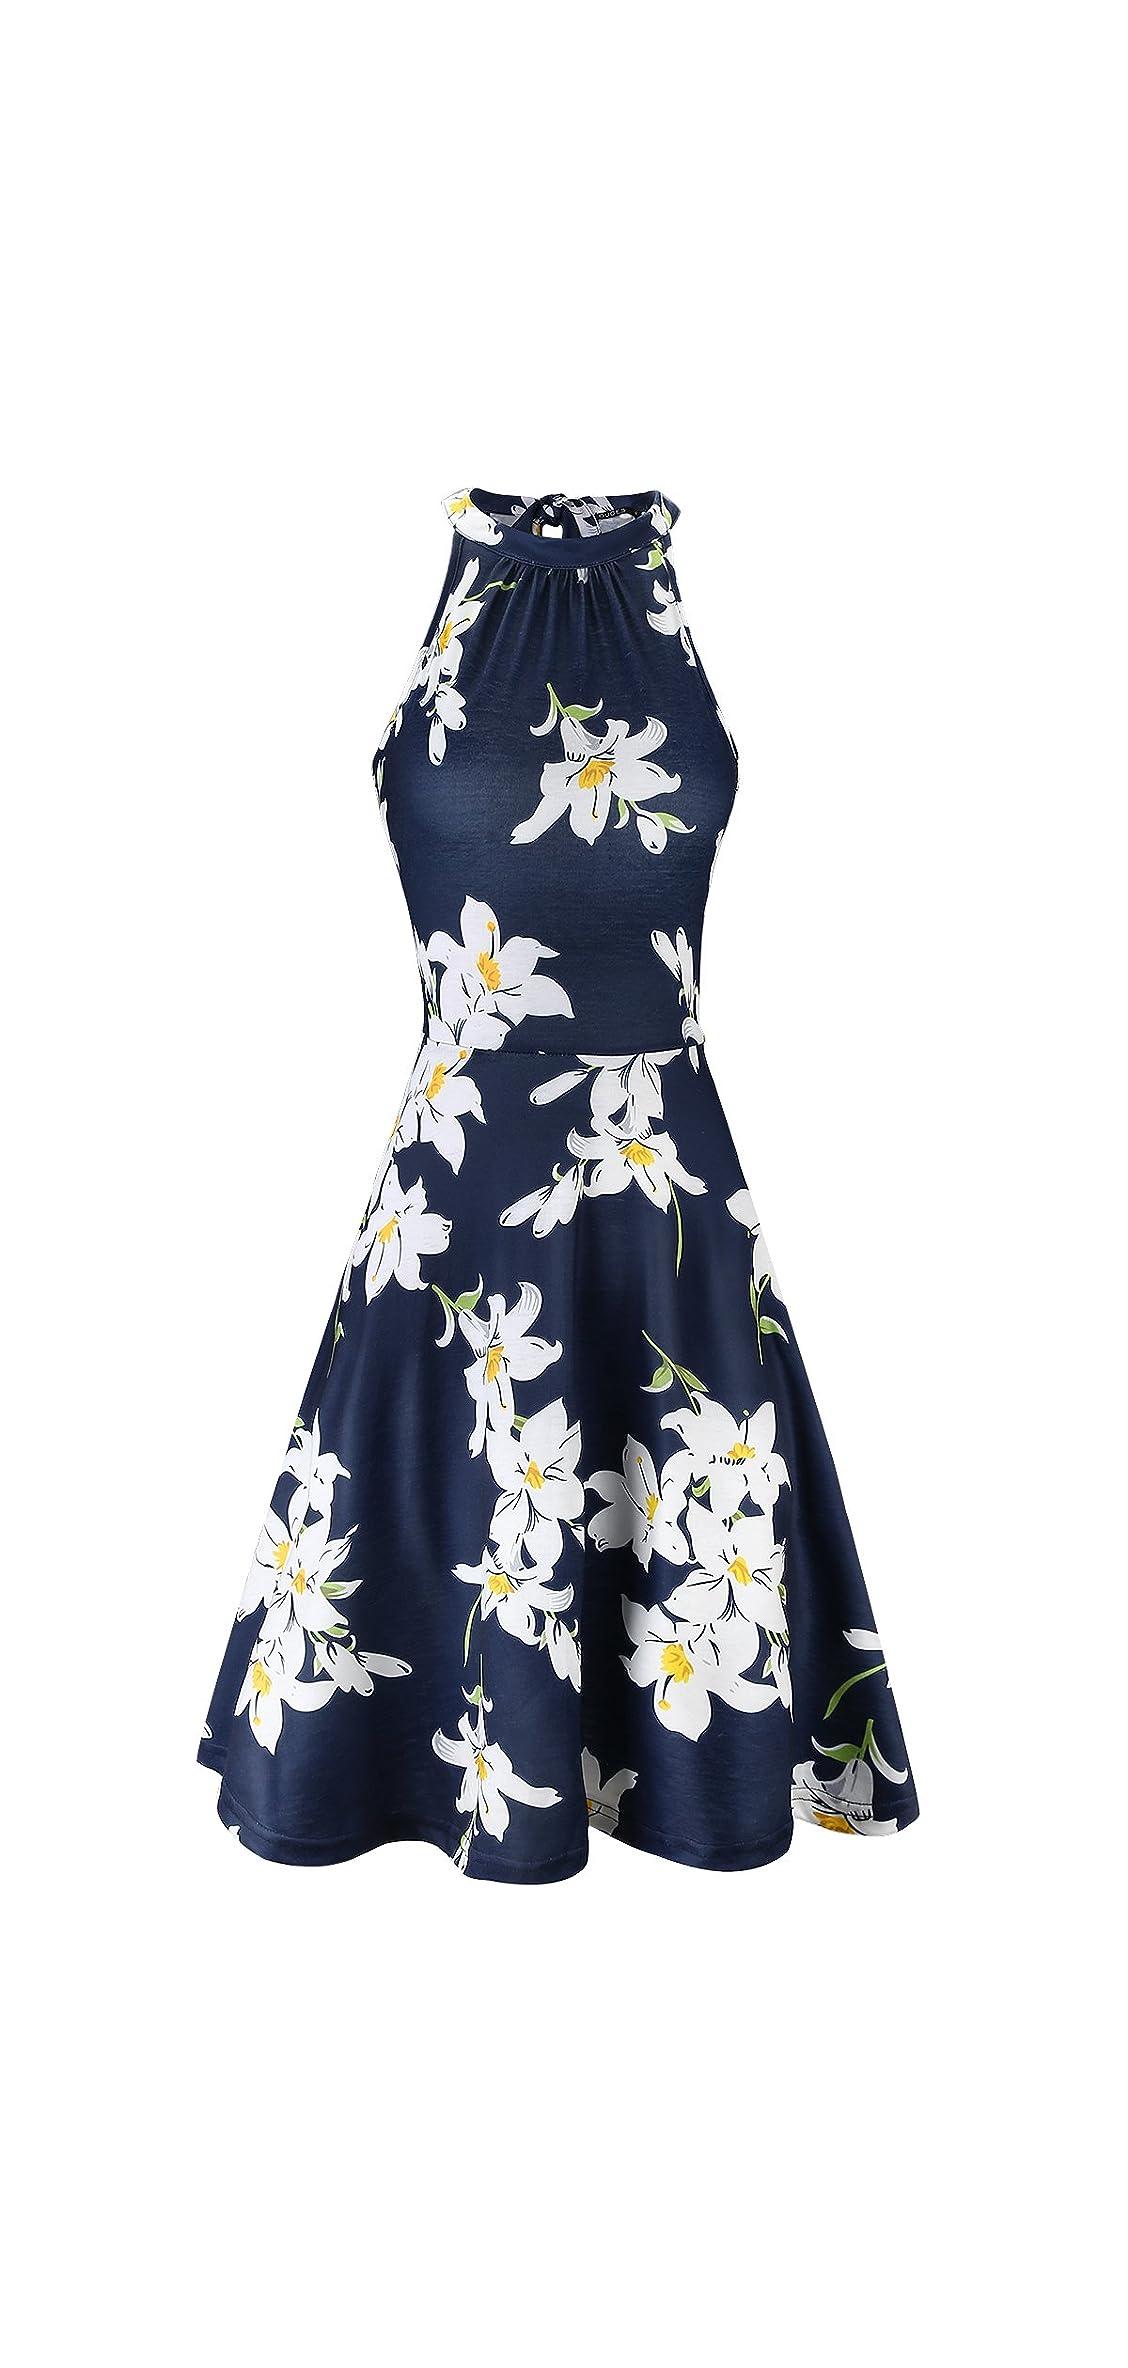 Women's Halter Neck Floral Summer Casual Sundress